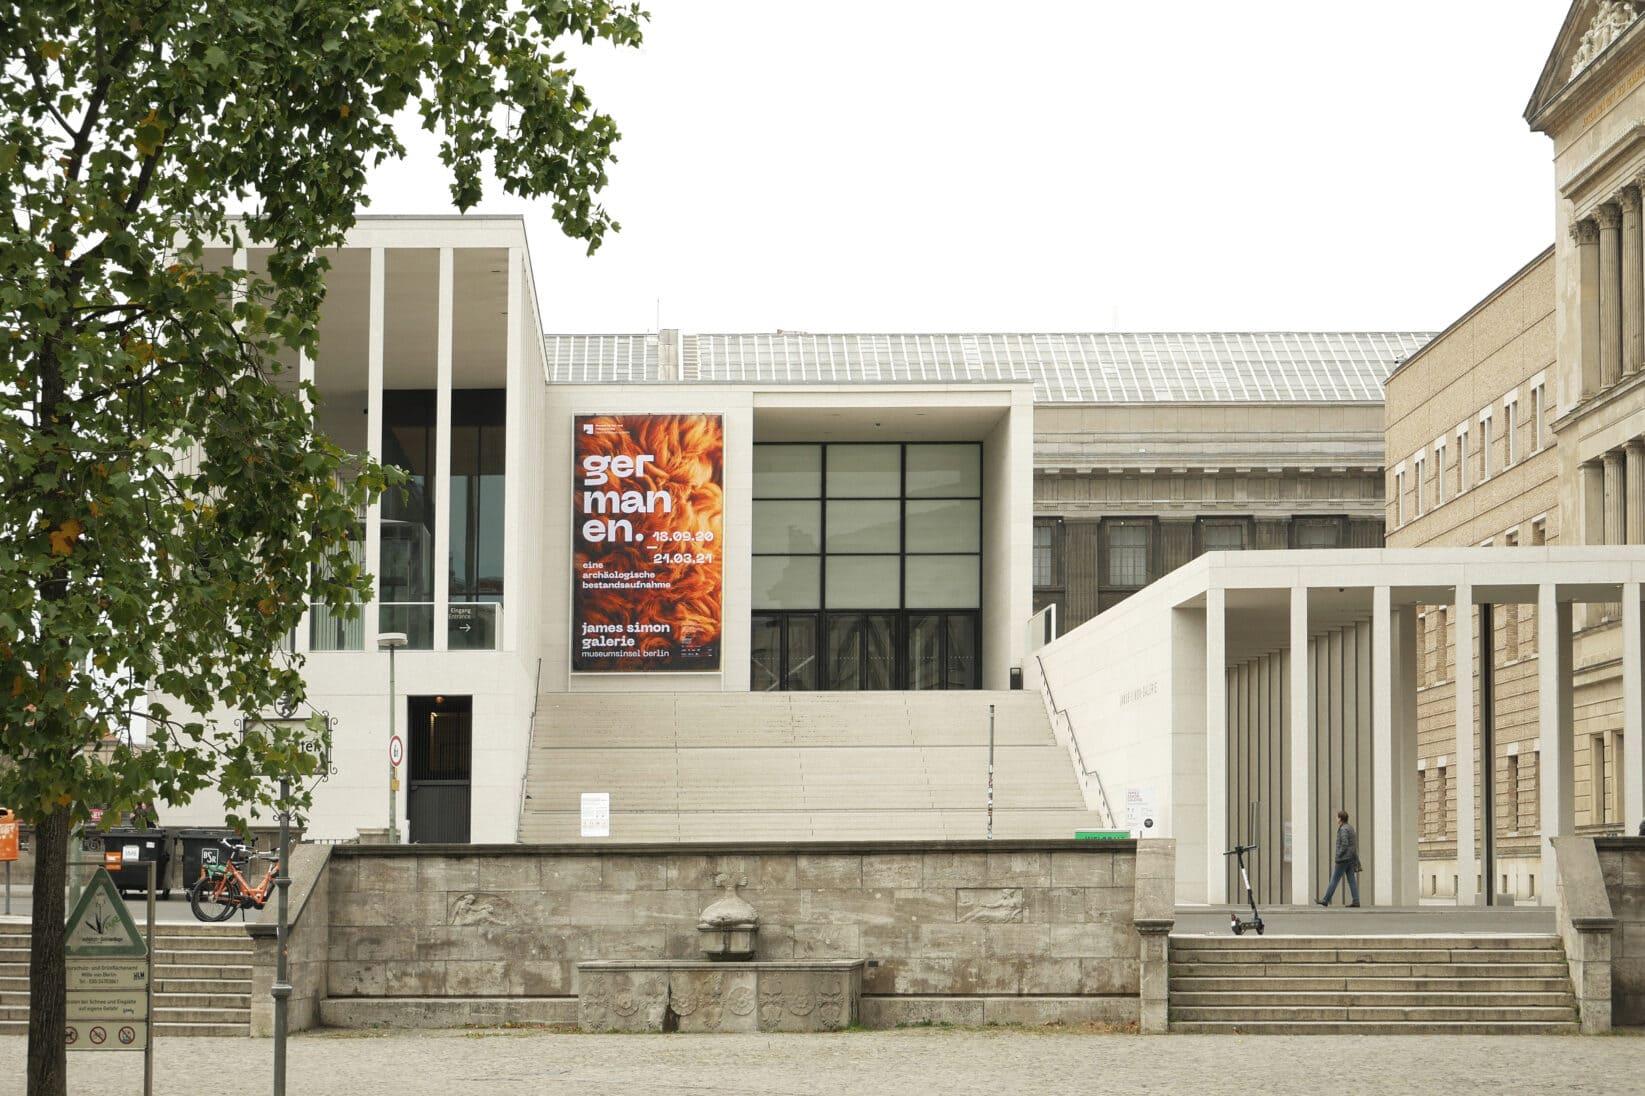 Germanen Banner an James Simon-Galerie